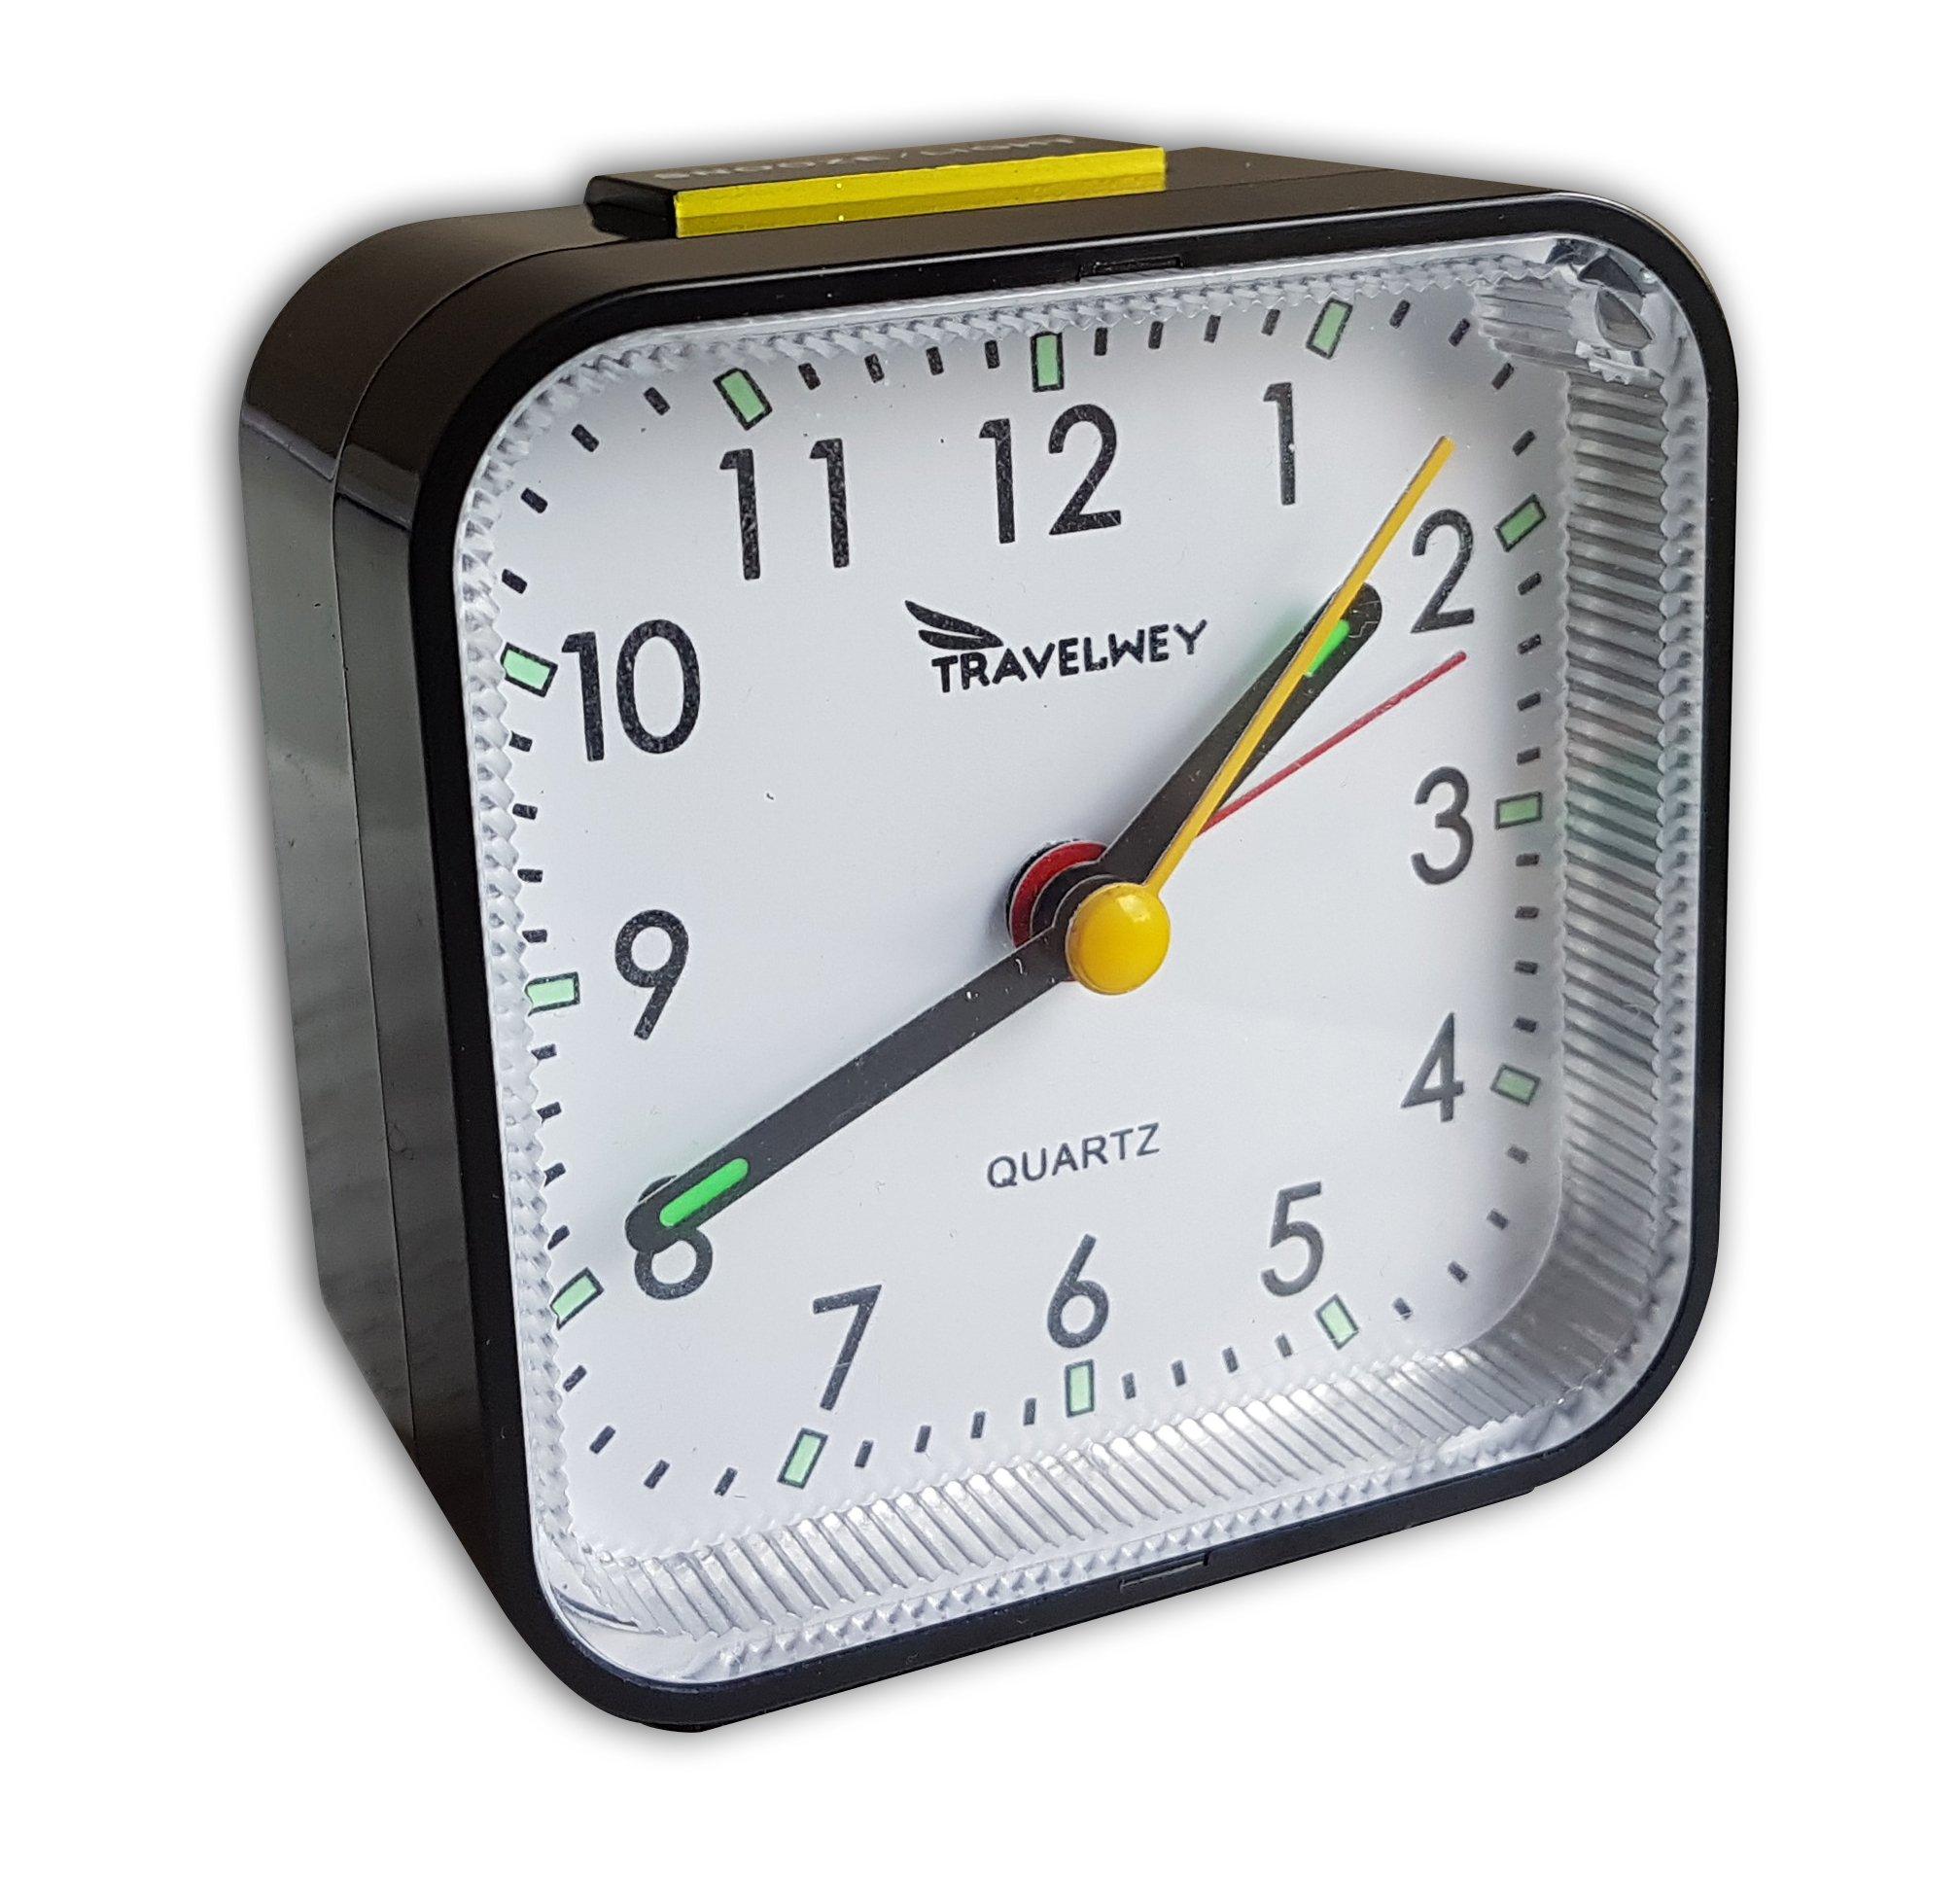 Desk Clock - Analog Movement, Snooze, Alarm, Light, Battery Operated, Perfect for Bedside, Desk or Travel, Black